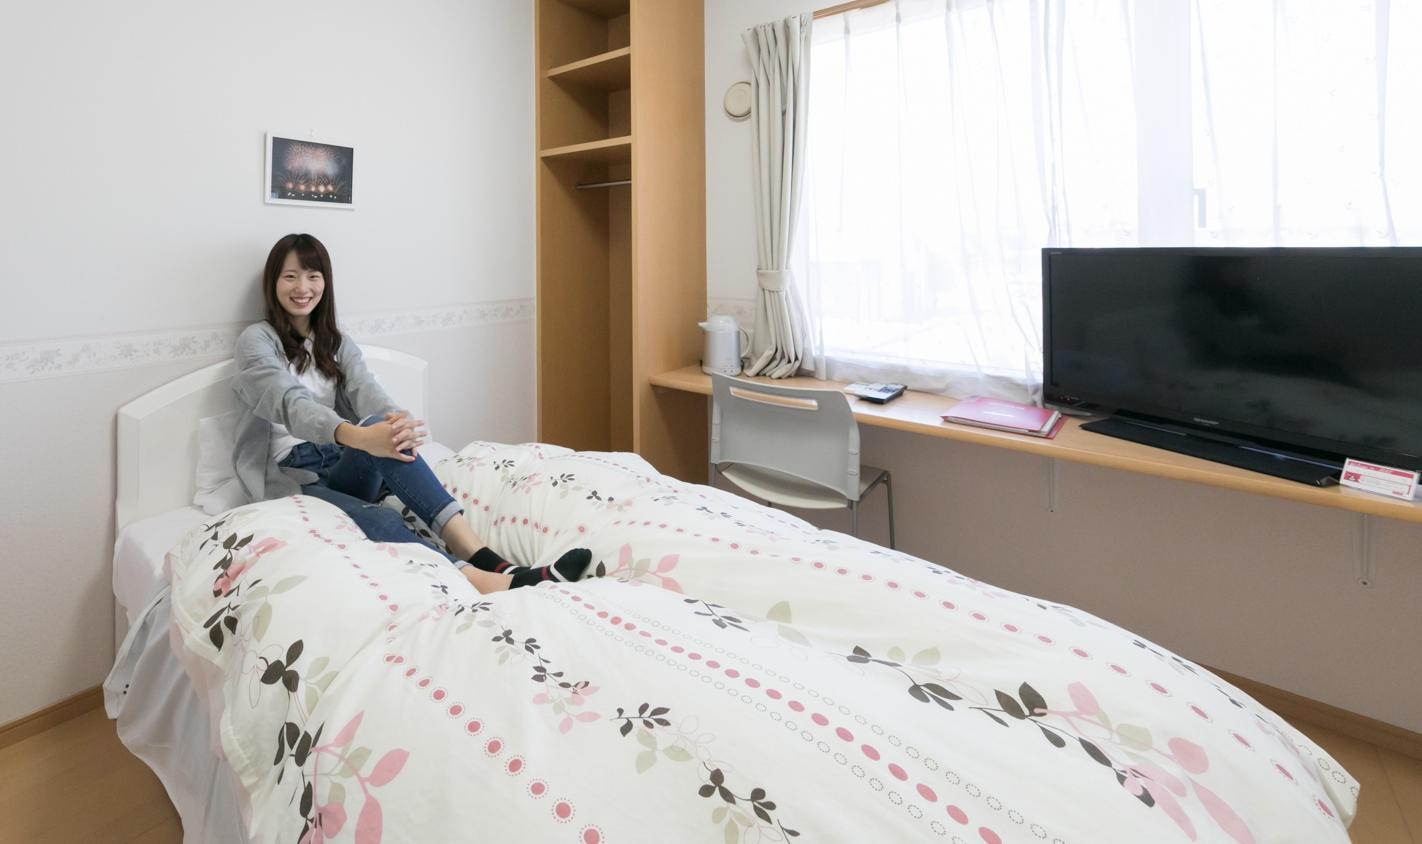 MAXドライビングスクール千曲 合宿免許 女性専用宿舎